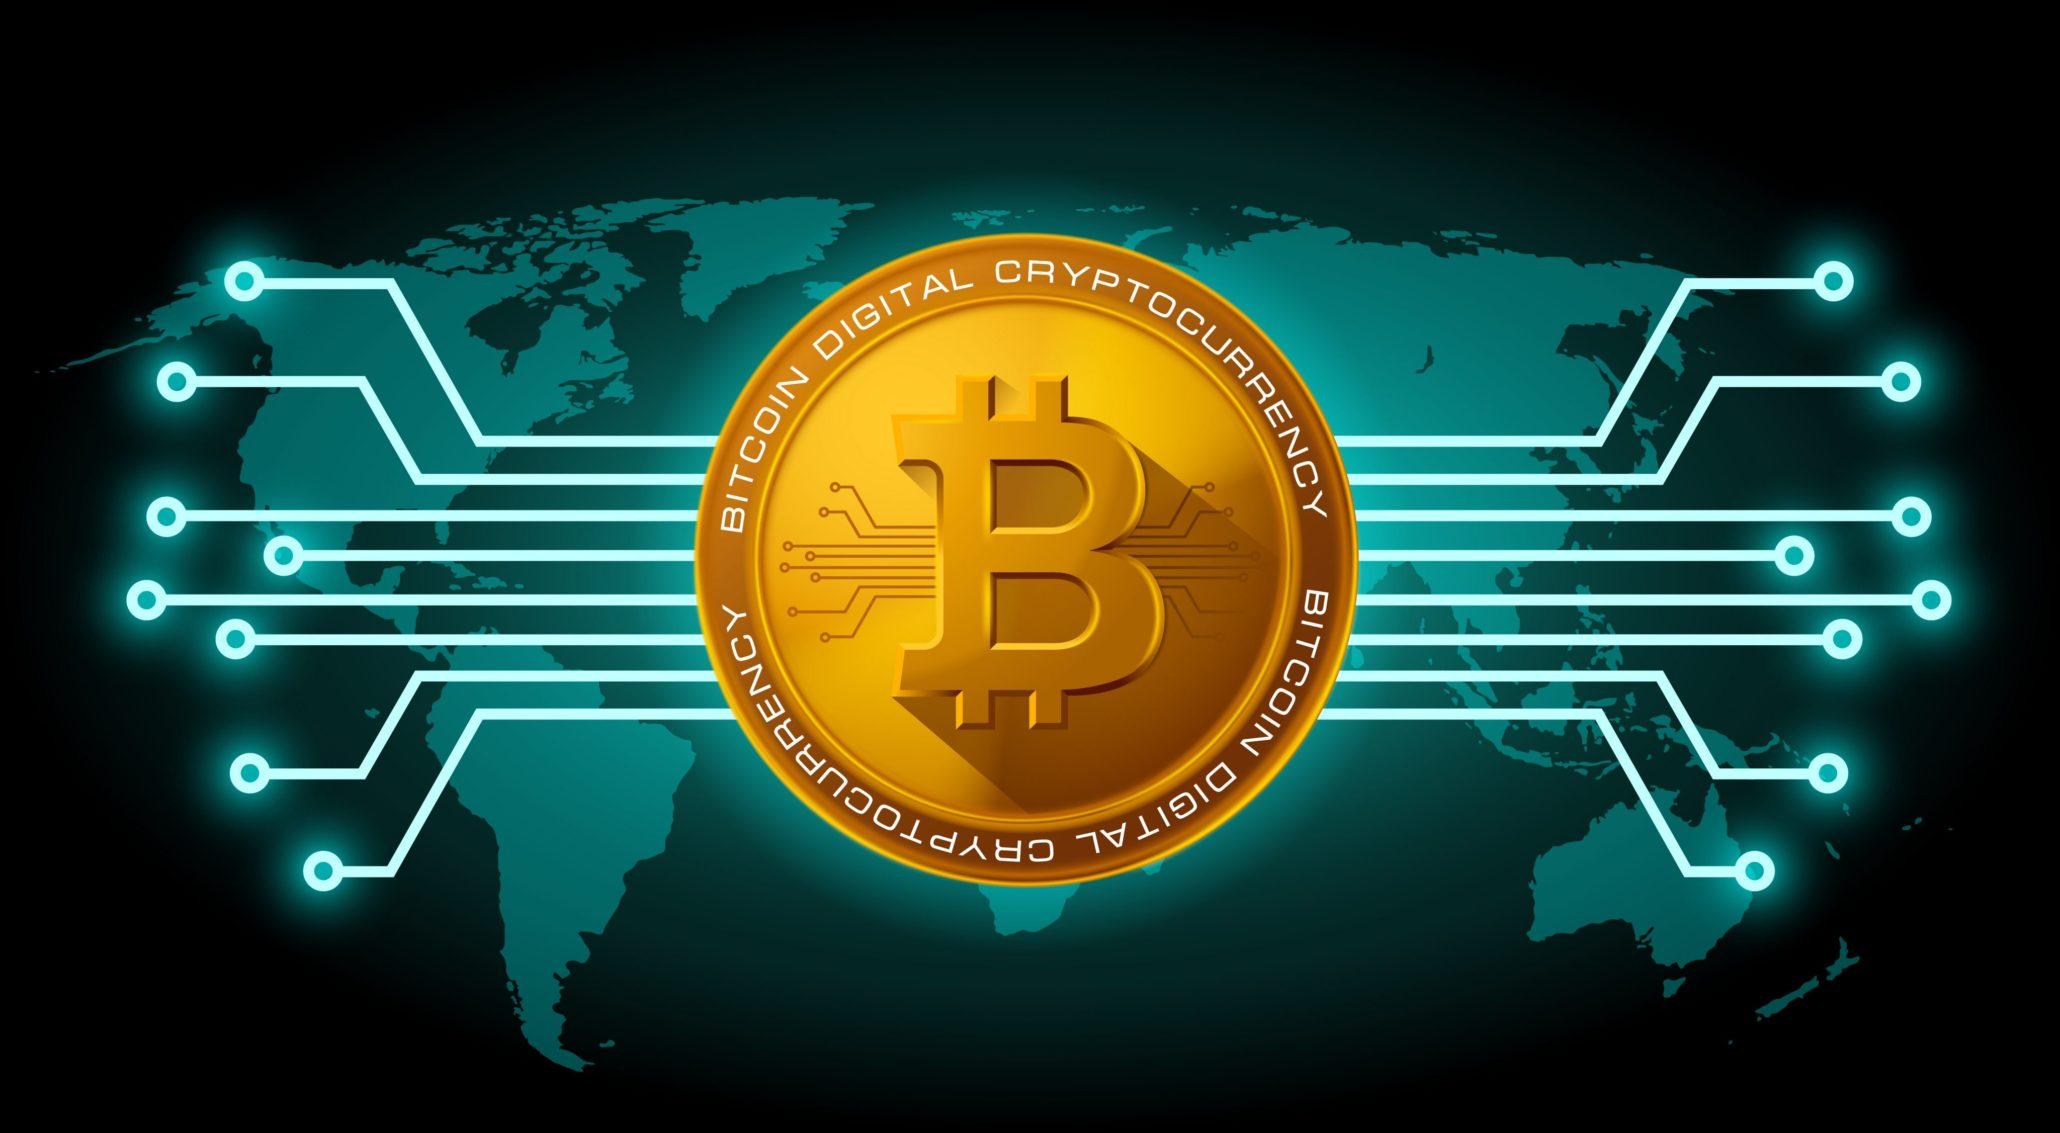 Explicamos o Gráfico Bitcoin e onde você pode comprar a Criptomoeda